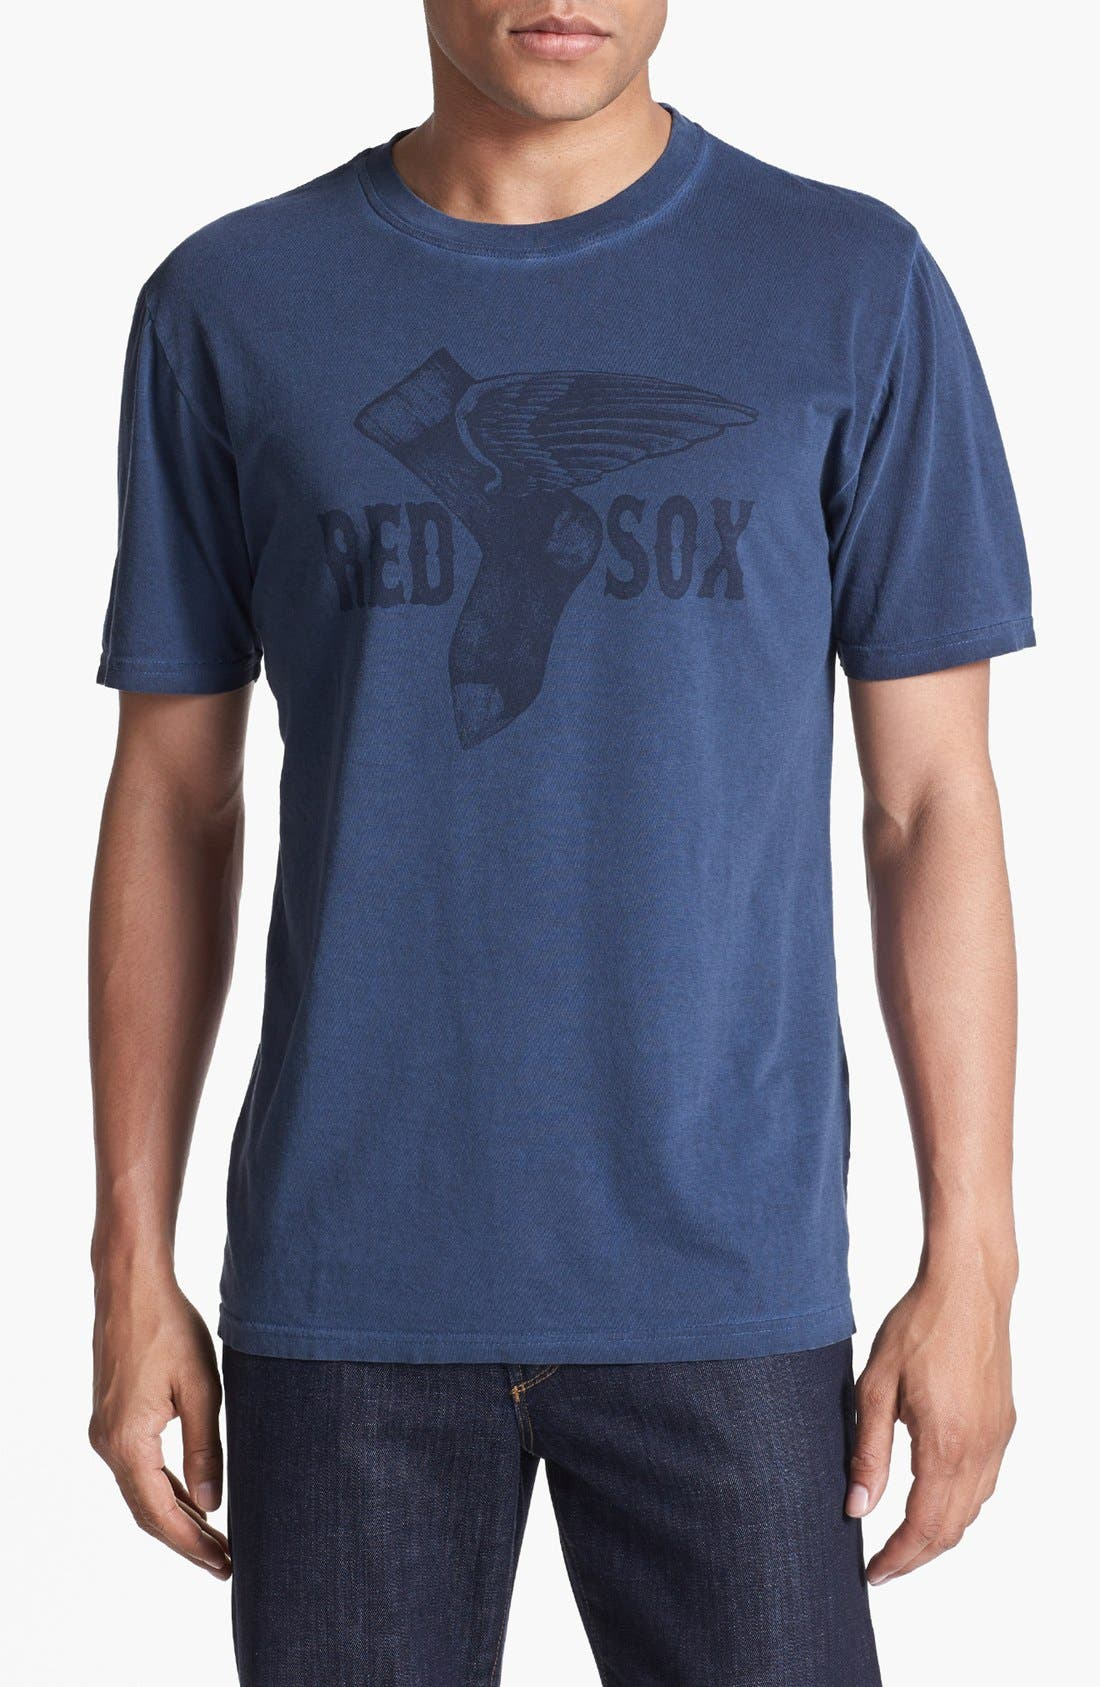 Main Image - Red Jacket 'Red Sox - Merit' T-Shirt